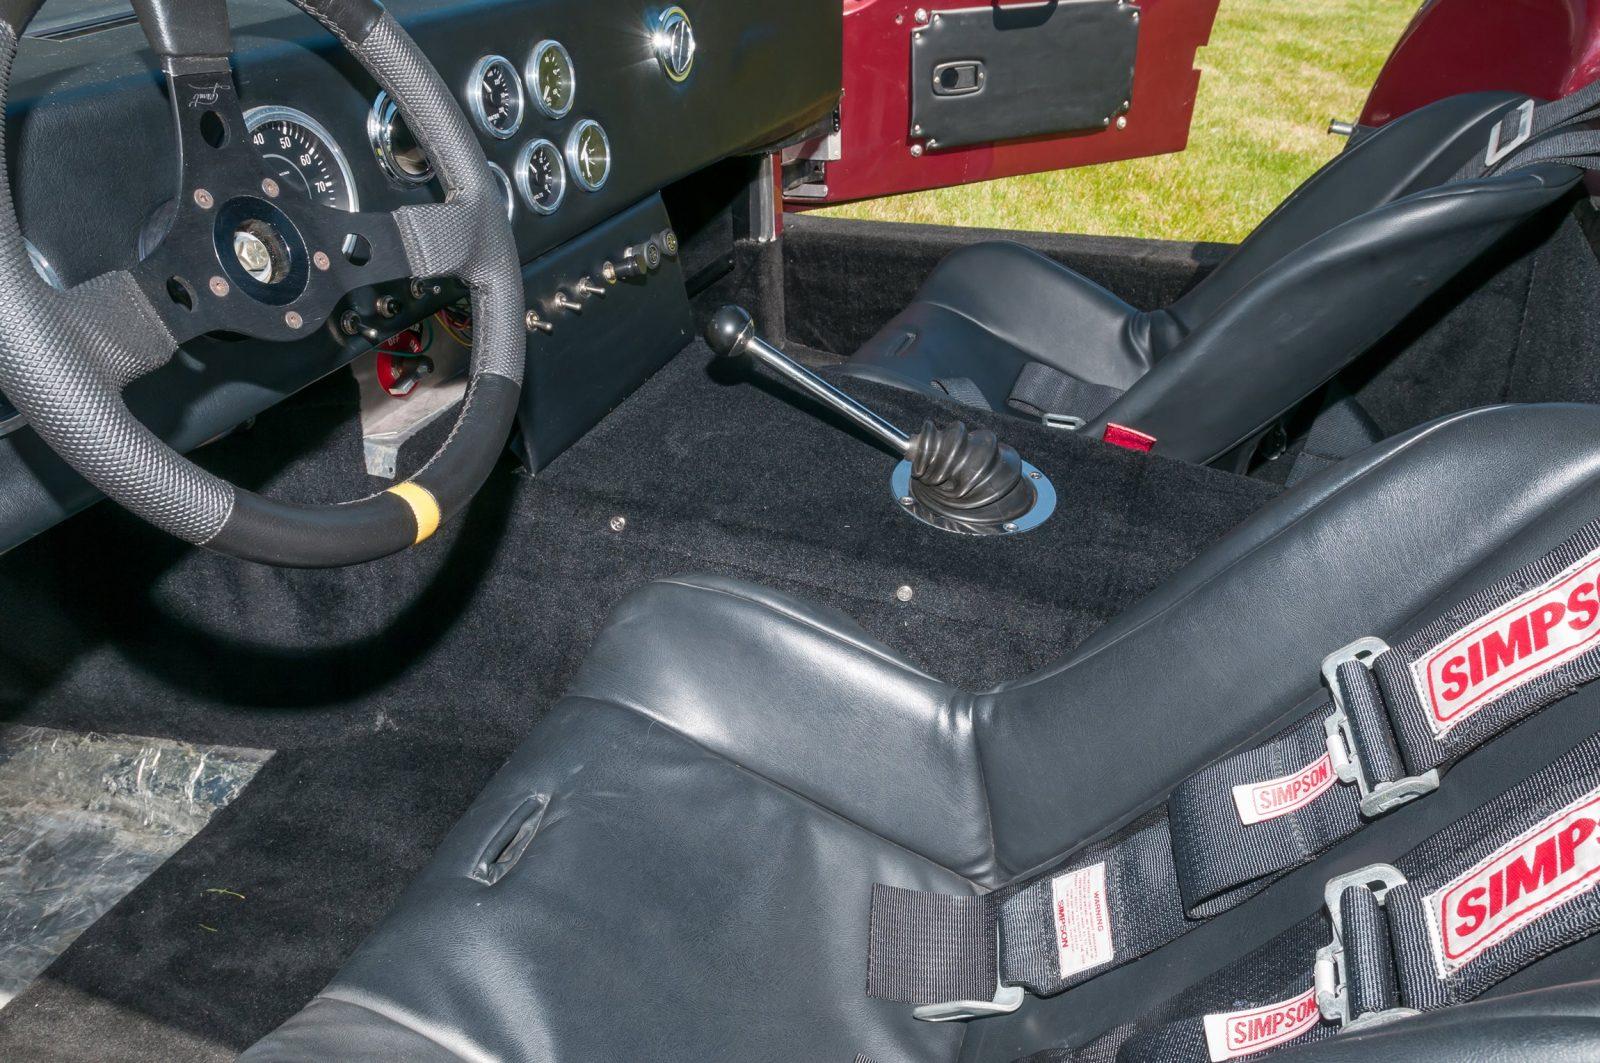 2008 Factory Five Type 65 'Daytona' Coupe 10